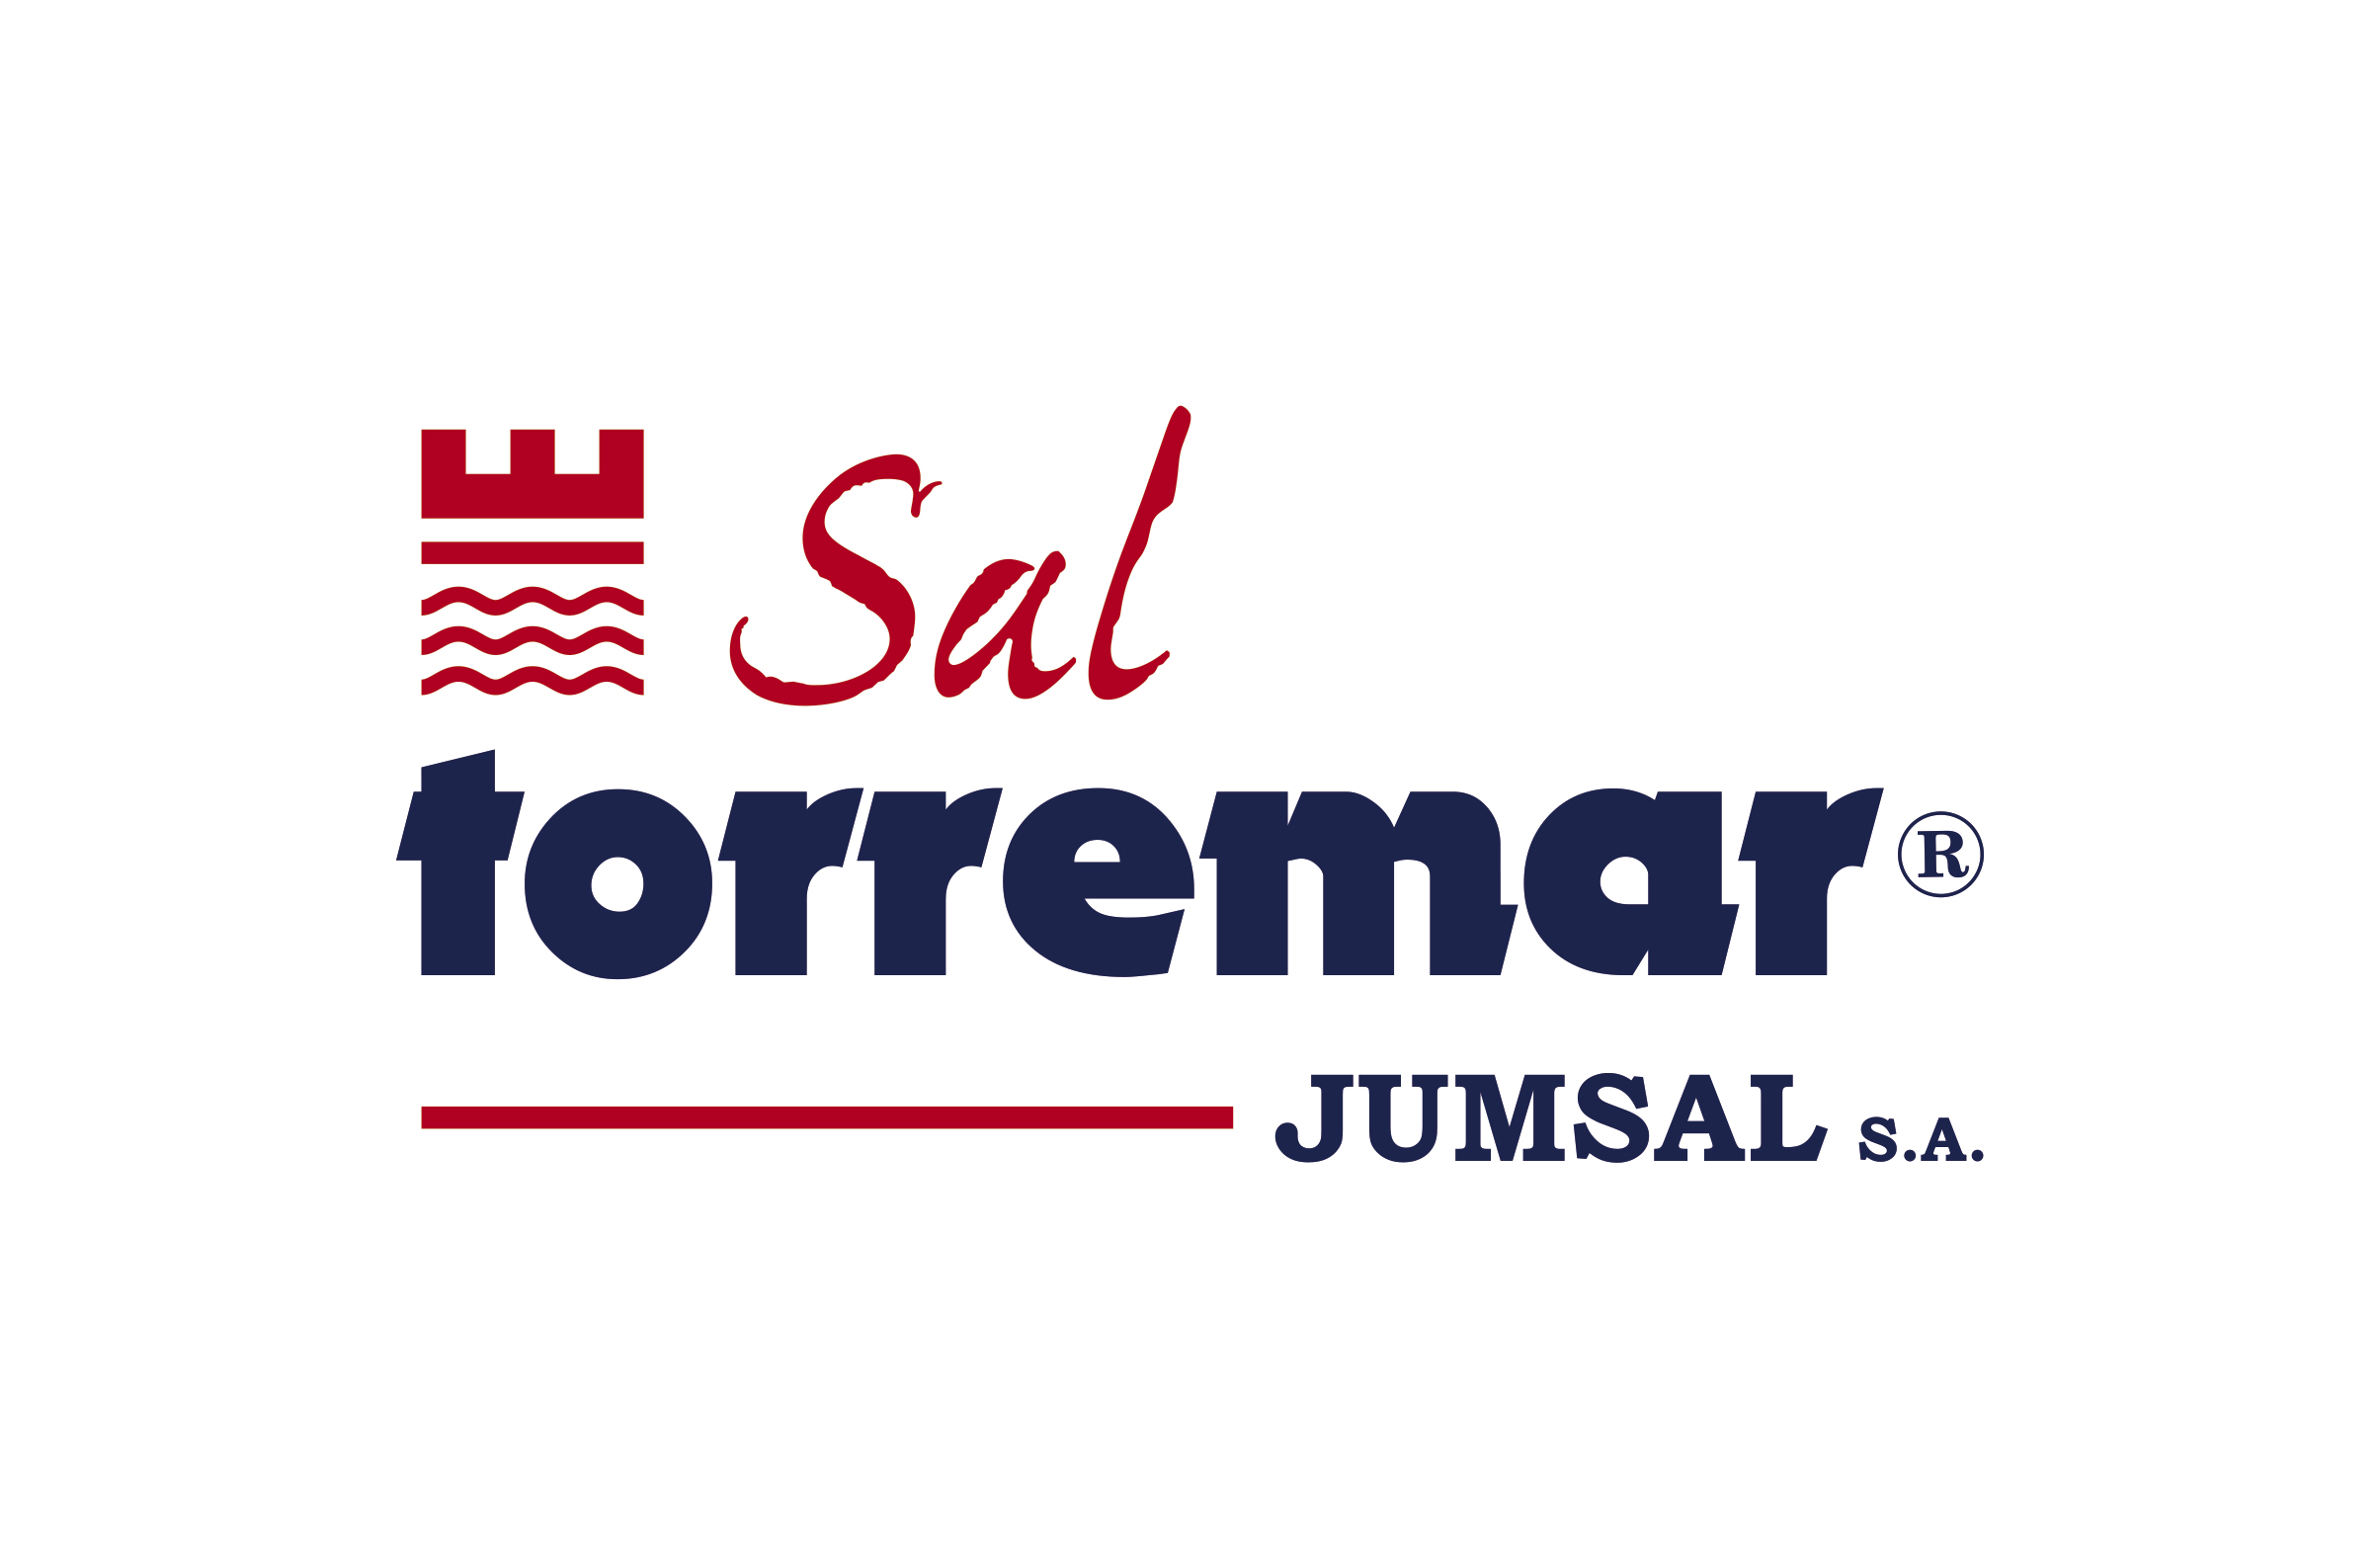 JUMSAL, S.A.